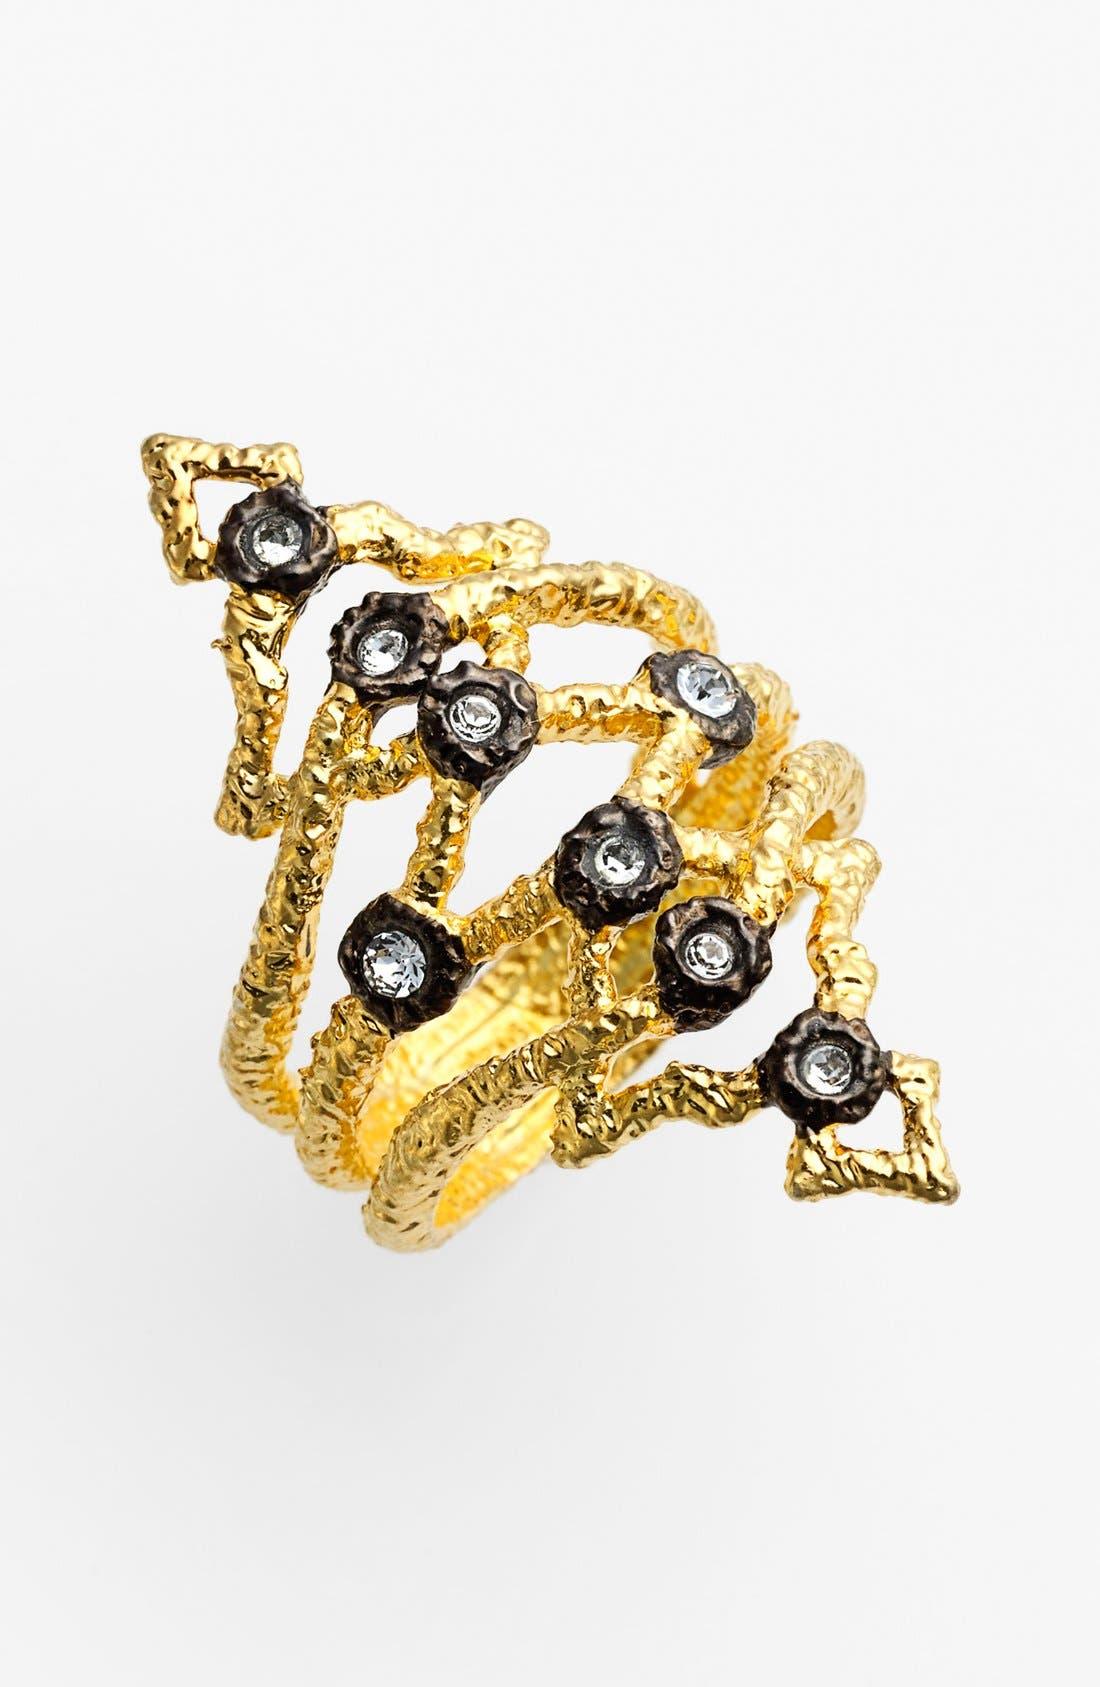 Alternate Image 1 Selected - Alexis Bittar 'Elements - Jardin de Papillon' Open Ring